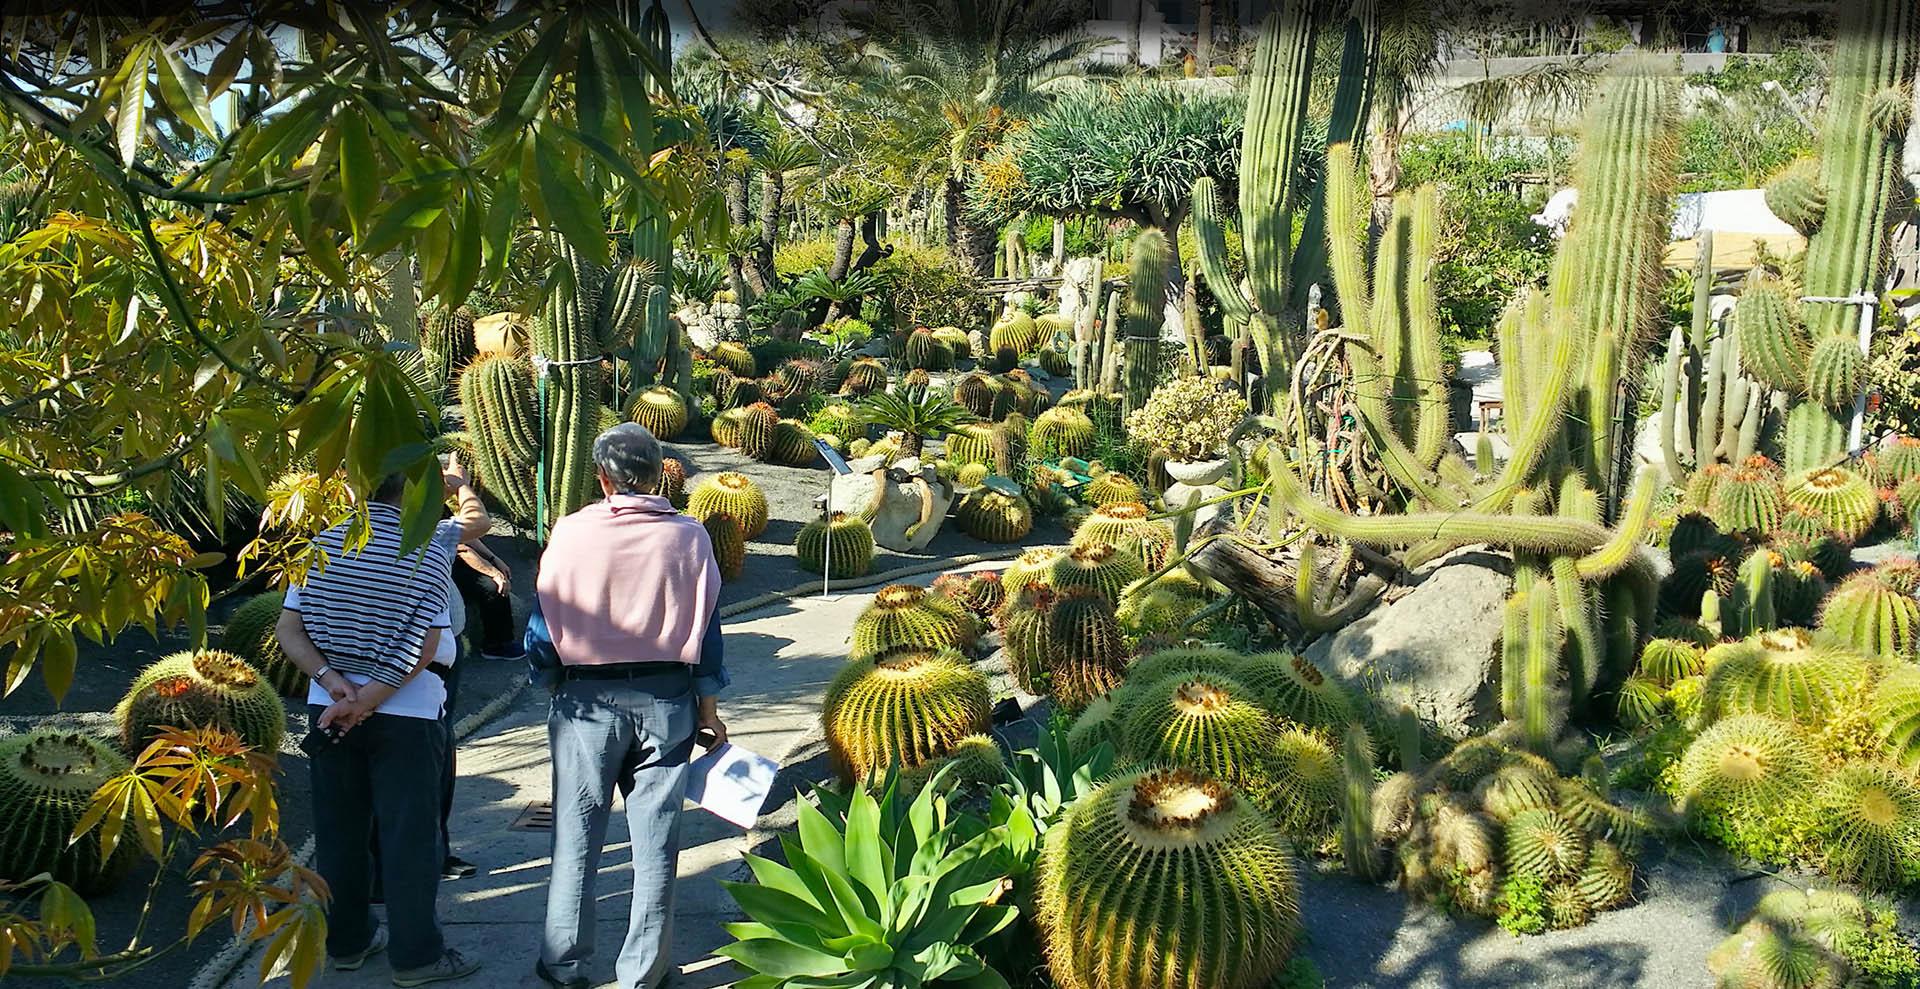 Ischia Giardino Botanico Ravino Pagina Ufficiale Cactus